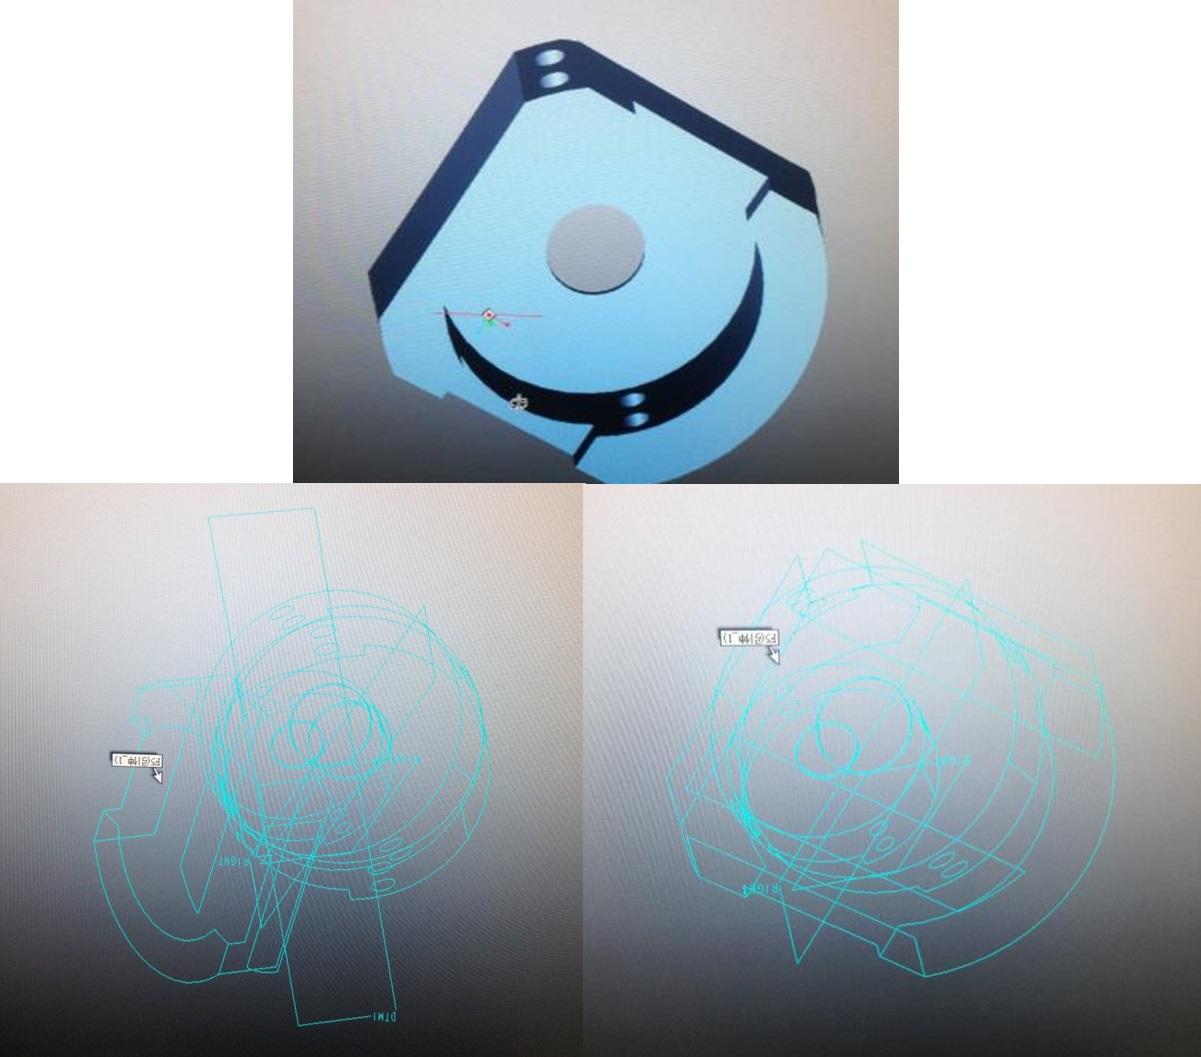 CAD软件技术学习交流区proe不见异常proe显cad看显示模型图片